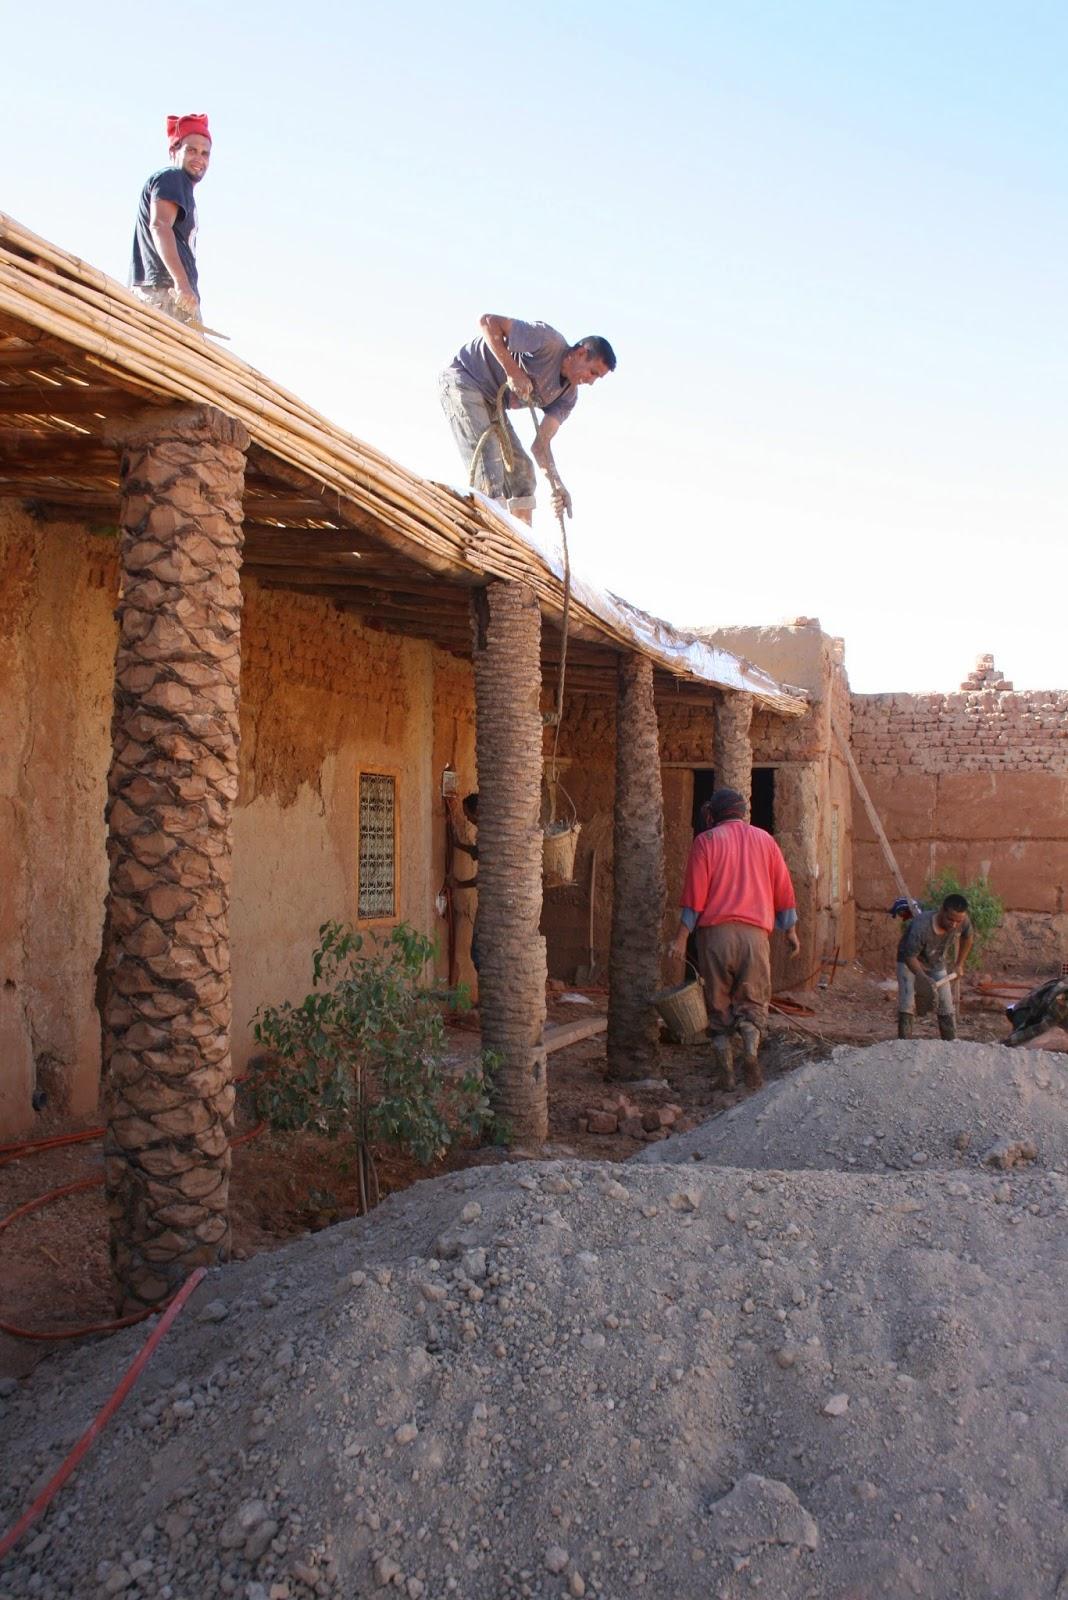 adobe, desierto, bereber, viajes a marruecos, lunasurmarruecos, rallys